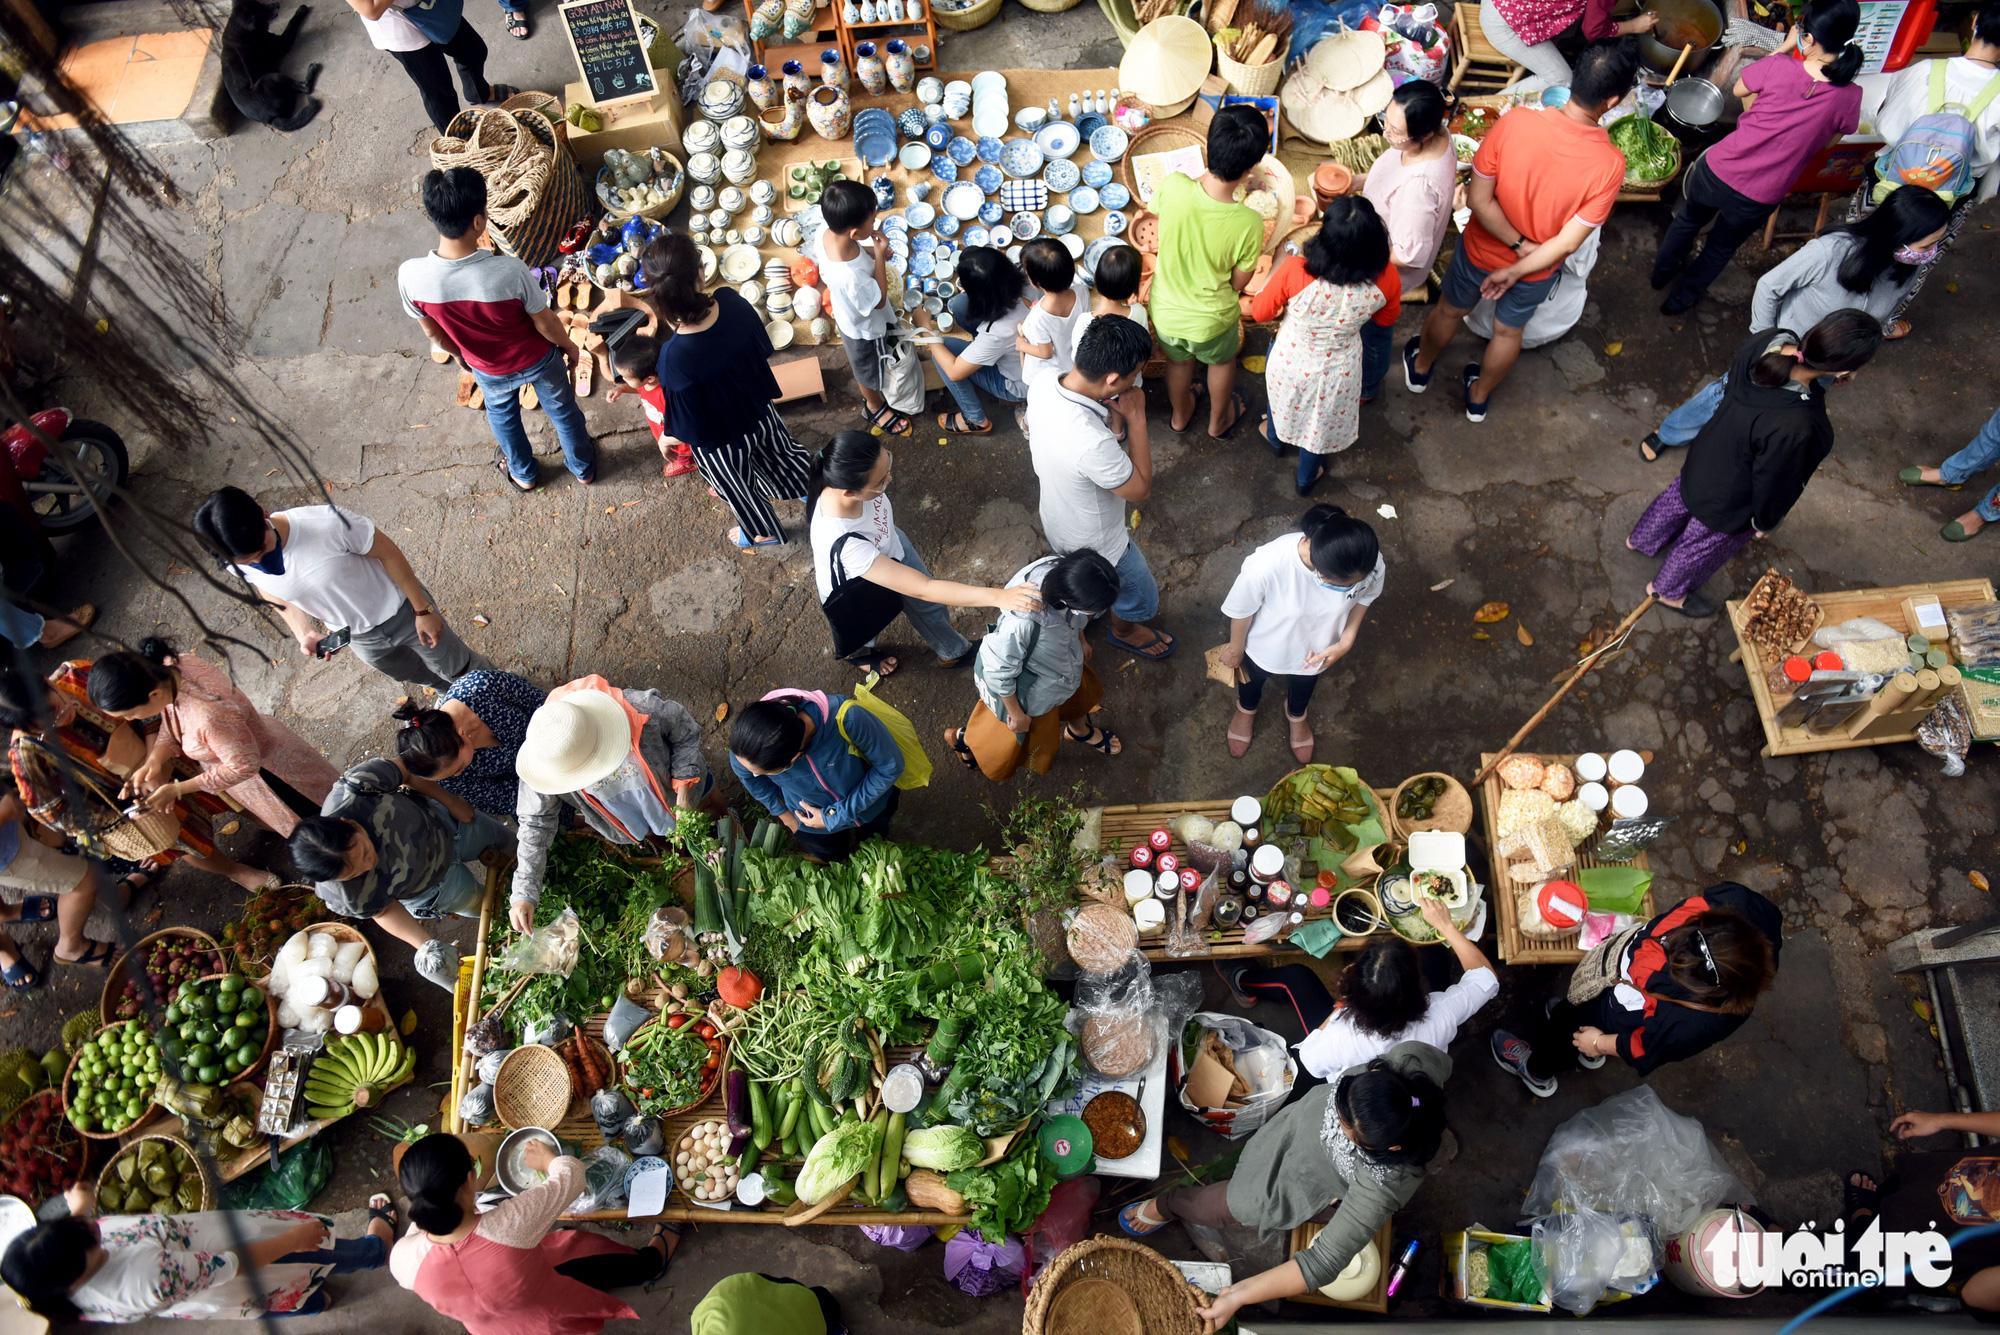 Shoppers tour a 'countryside market' at No. 7 Nguyen Thi Minh Khai Street, District 1, Ho Chi Minh City, Vietnam, May 24, 2020. Photo: Duyen Phan / Tuoi Tre